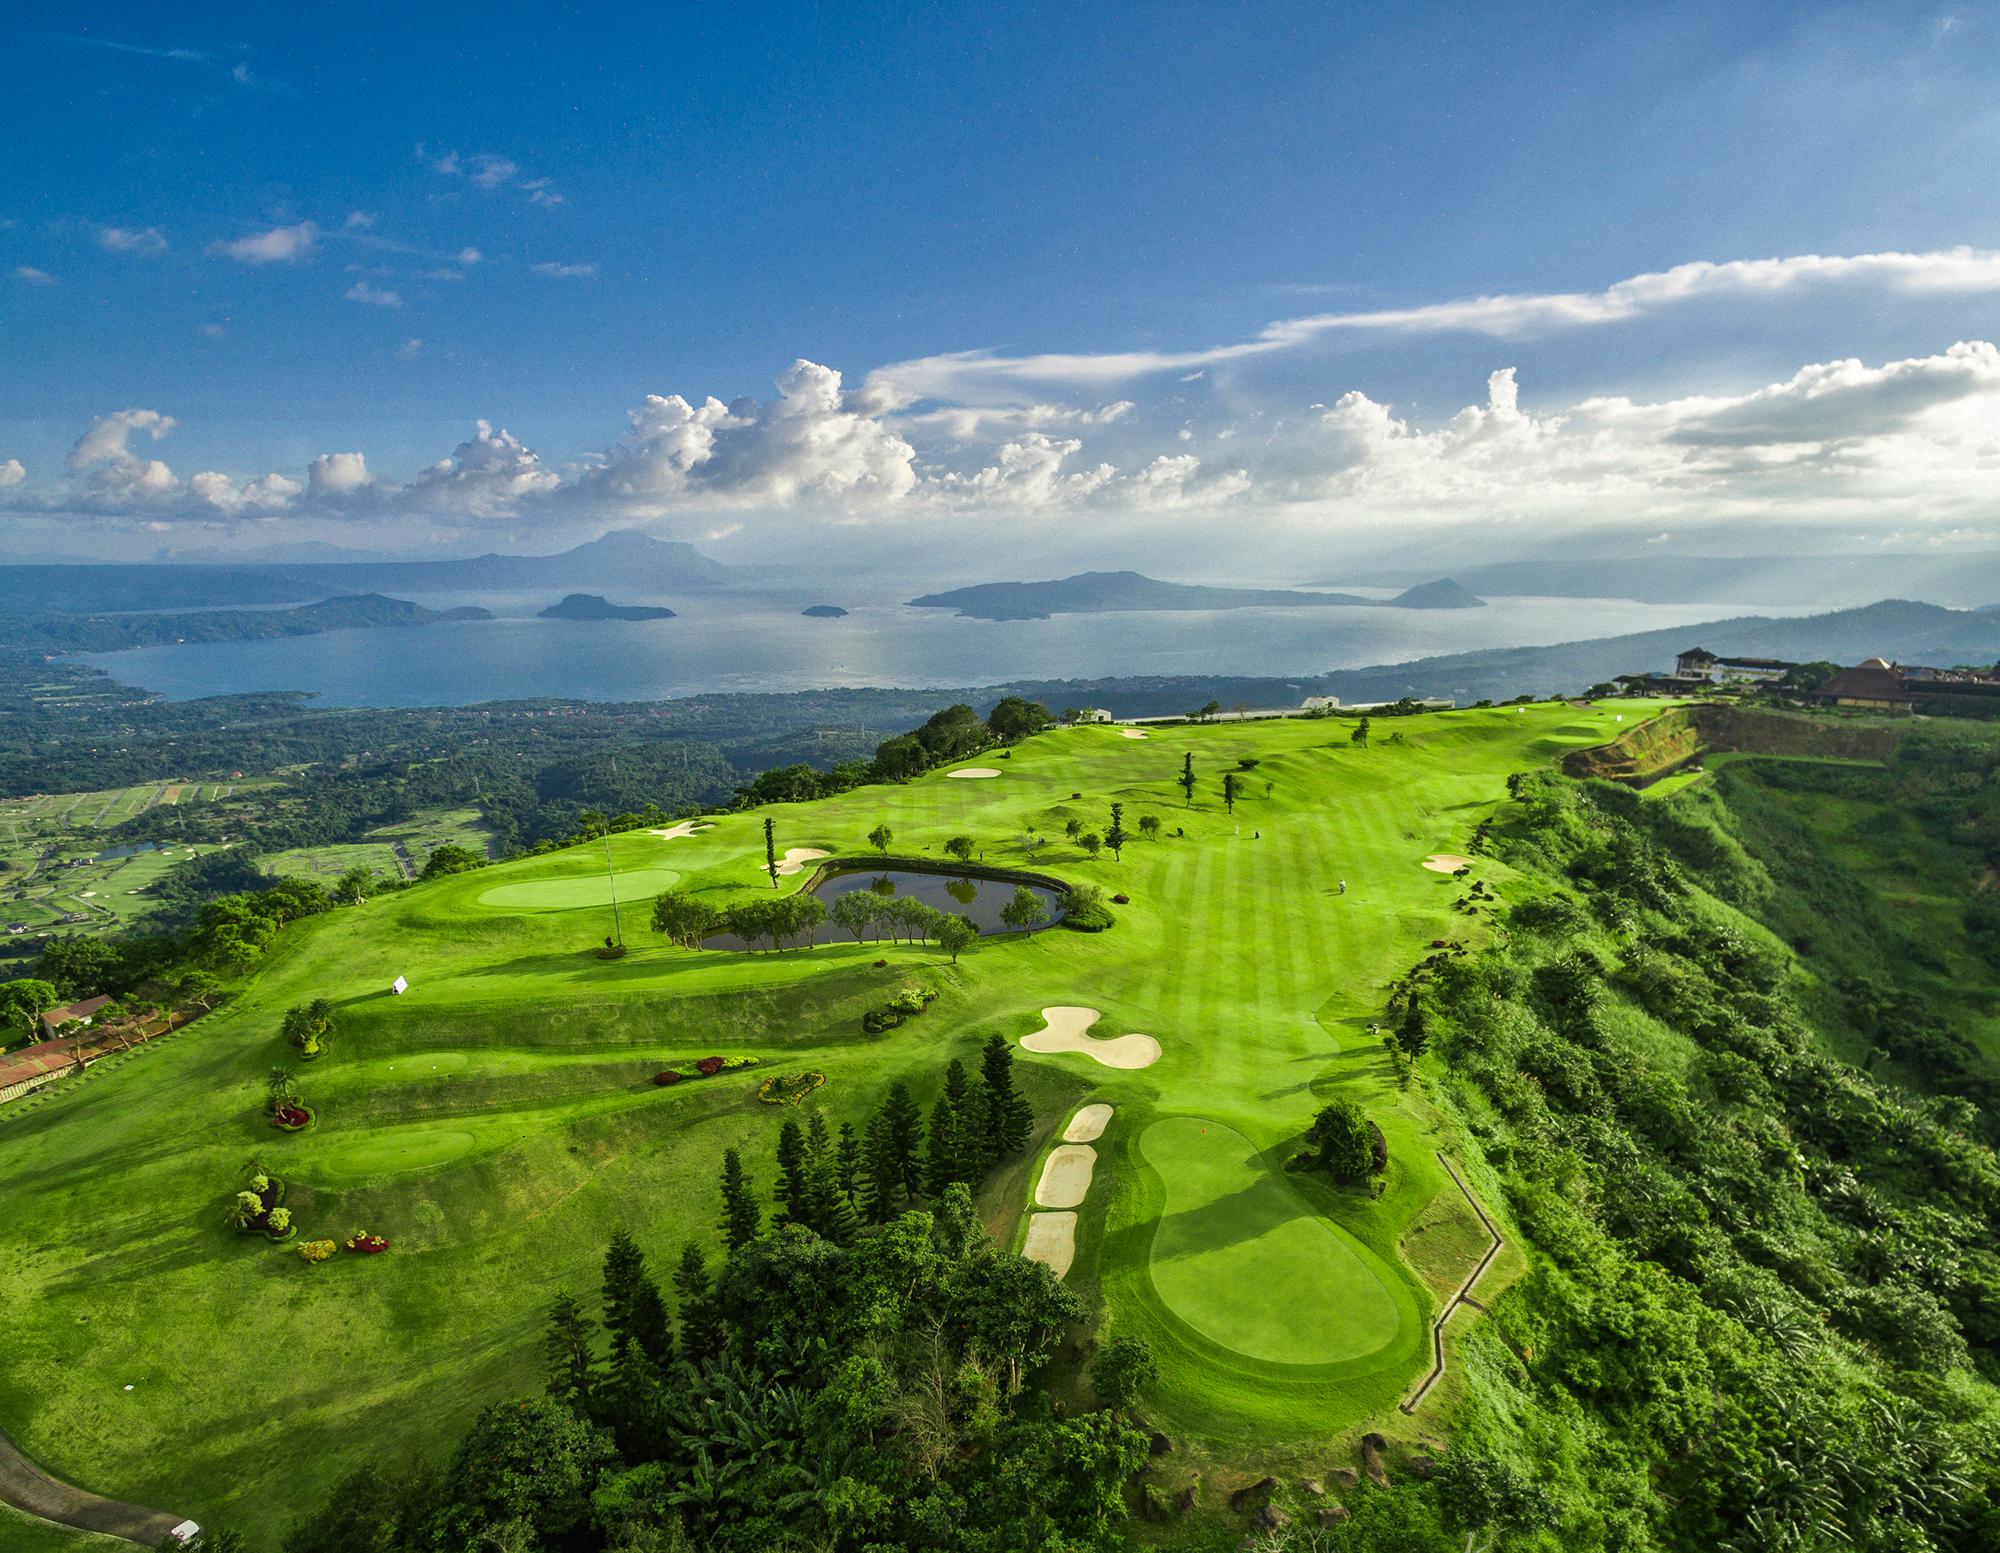 Tagaytay Highlands New Normal